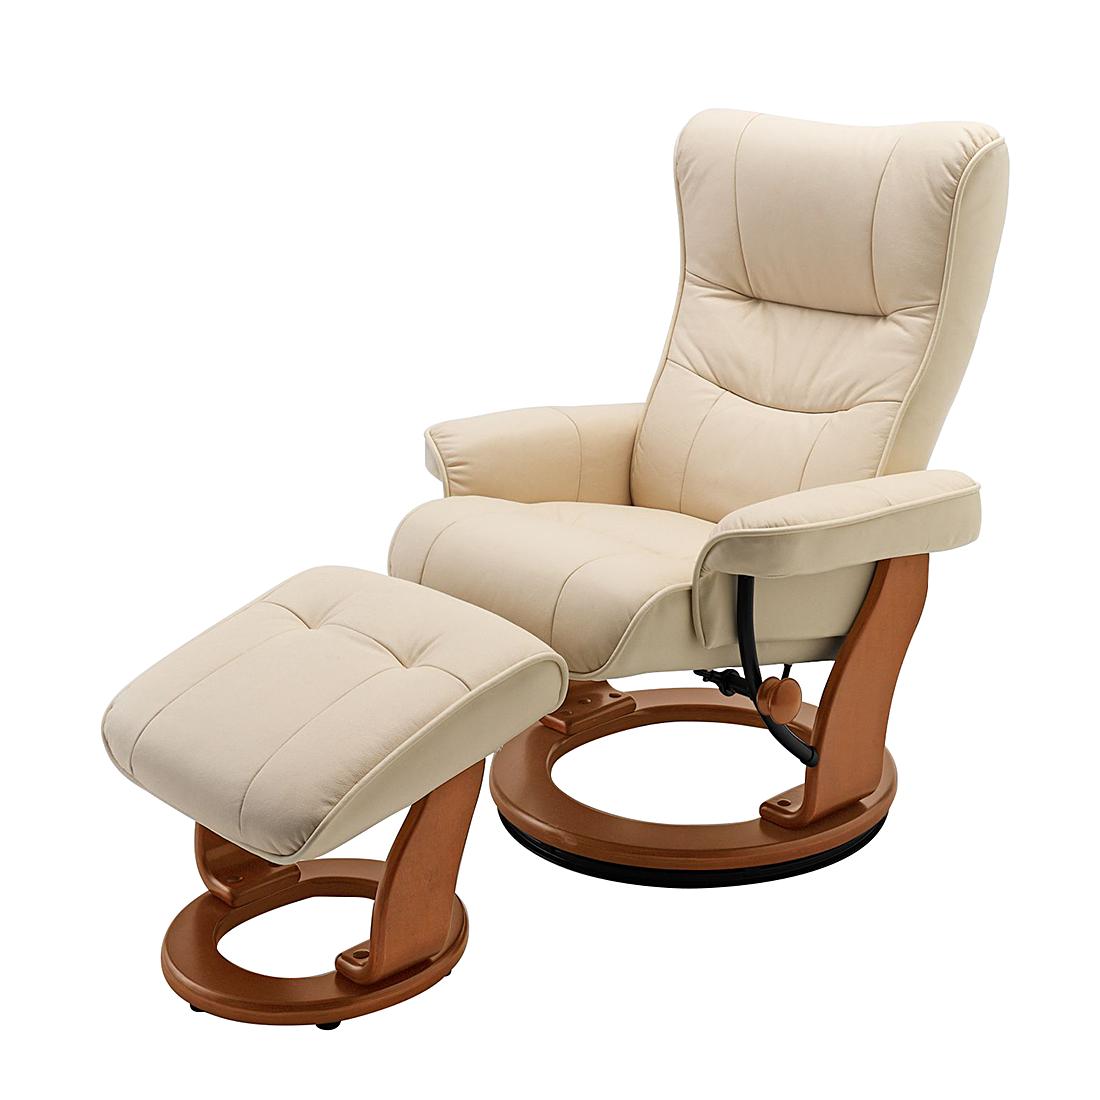 relaxsessel westerwald mit hocker echtleder tv sessel relaxliege ruhesessel 39 ebay. Black Bedroom Furniture Sets. Home Design Ideas